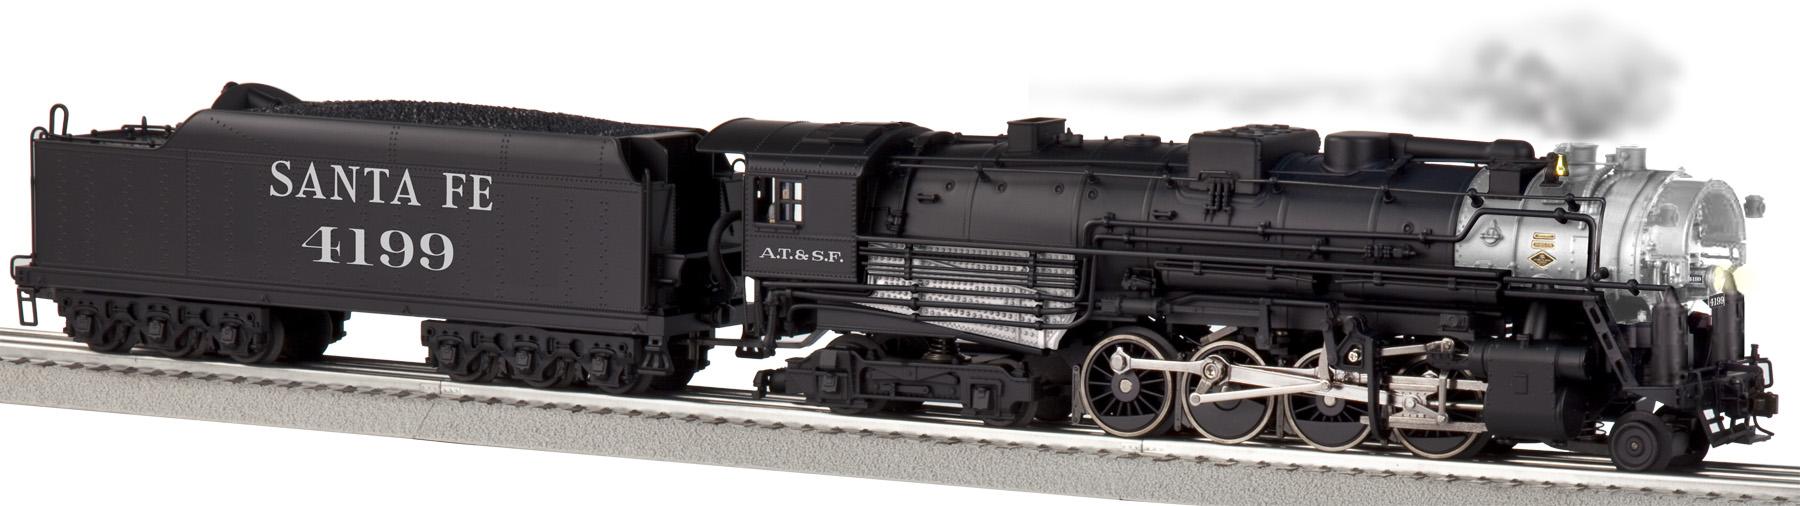 Santa Fe Legacy Scale 2 8 4 Berkshire Steam Locomotive 4199